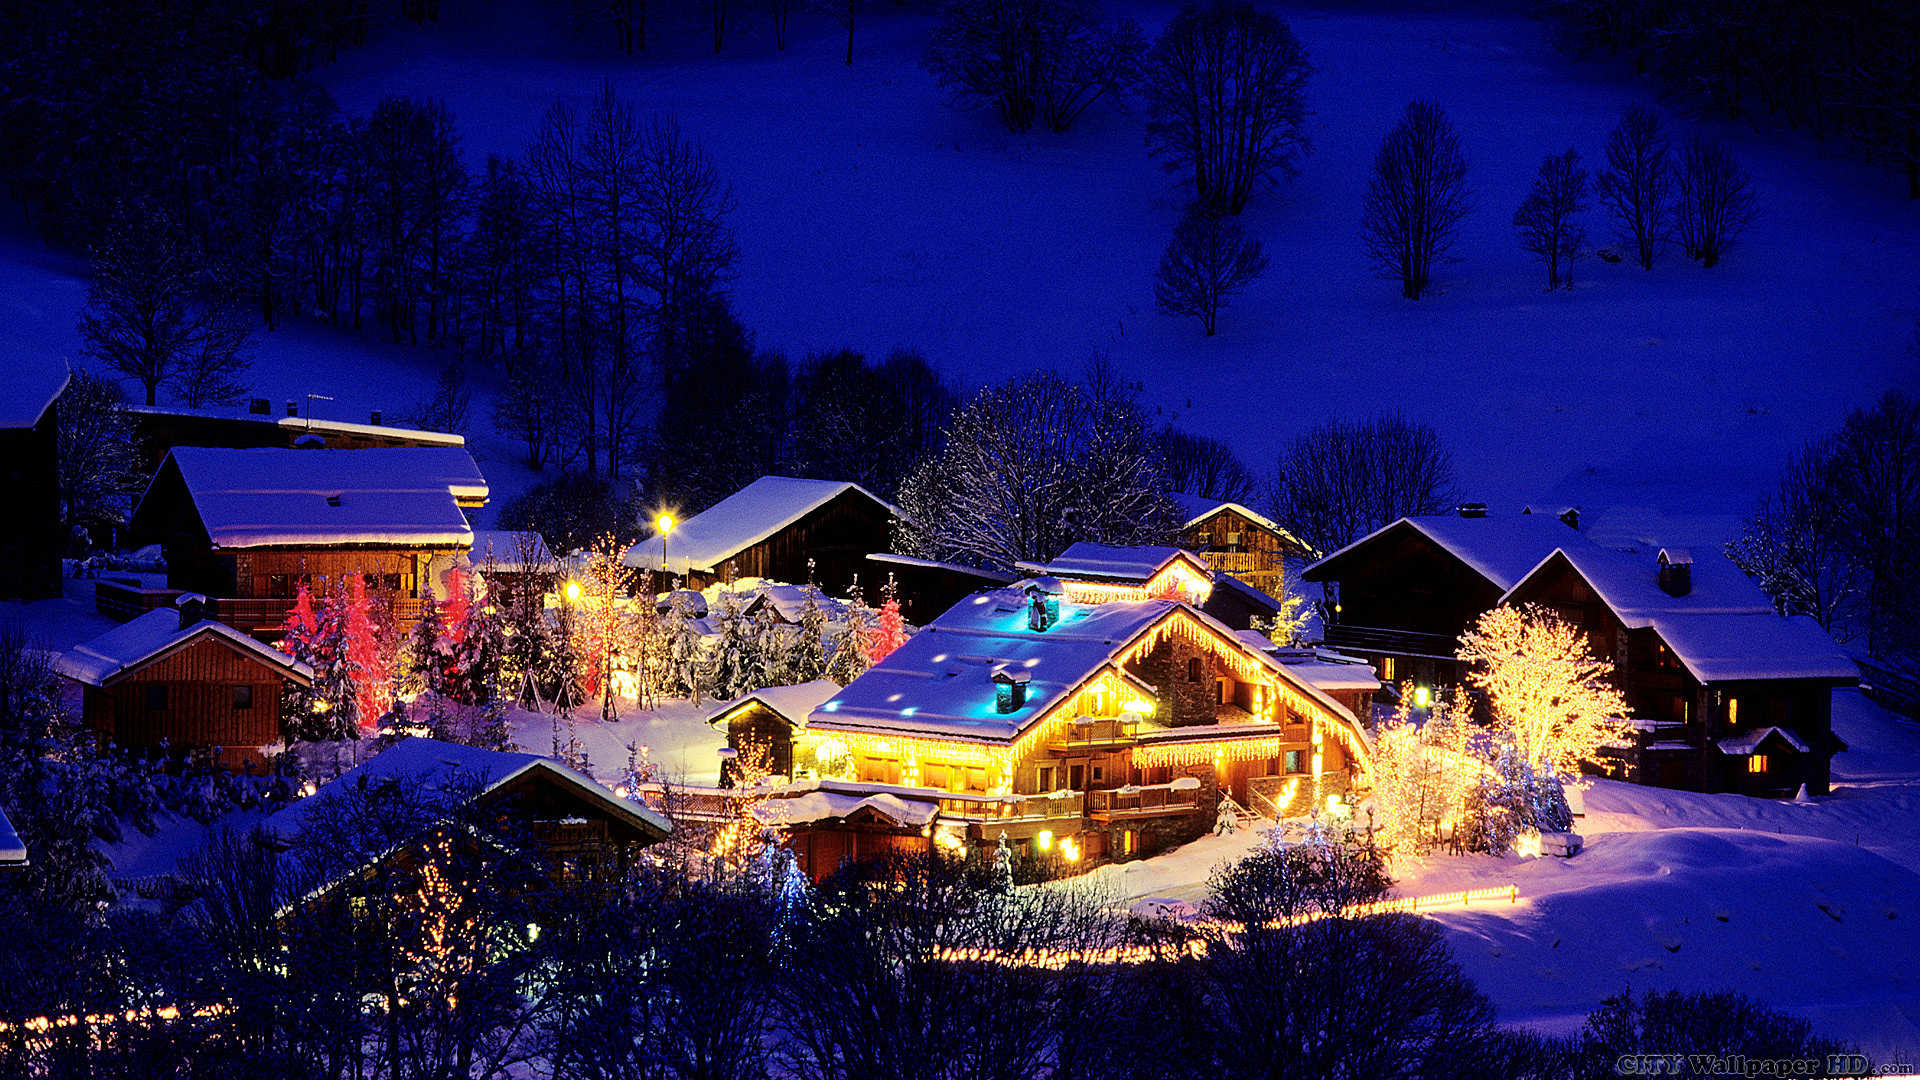 Sfondi Gratis Natalizi.Sfondi Hd Natale 59 Immagini